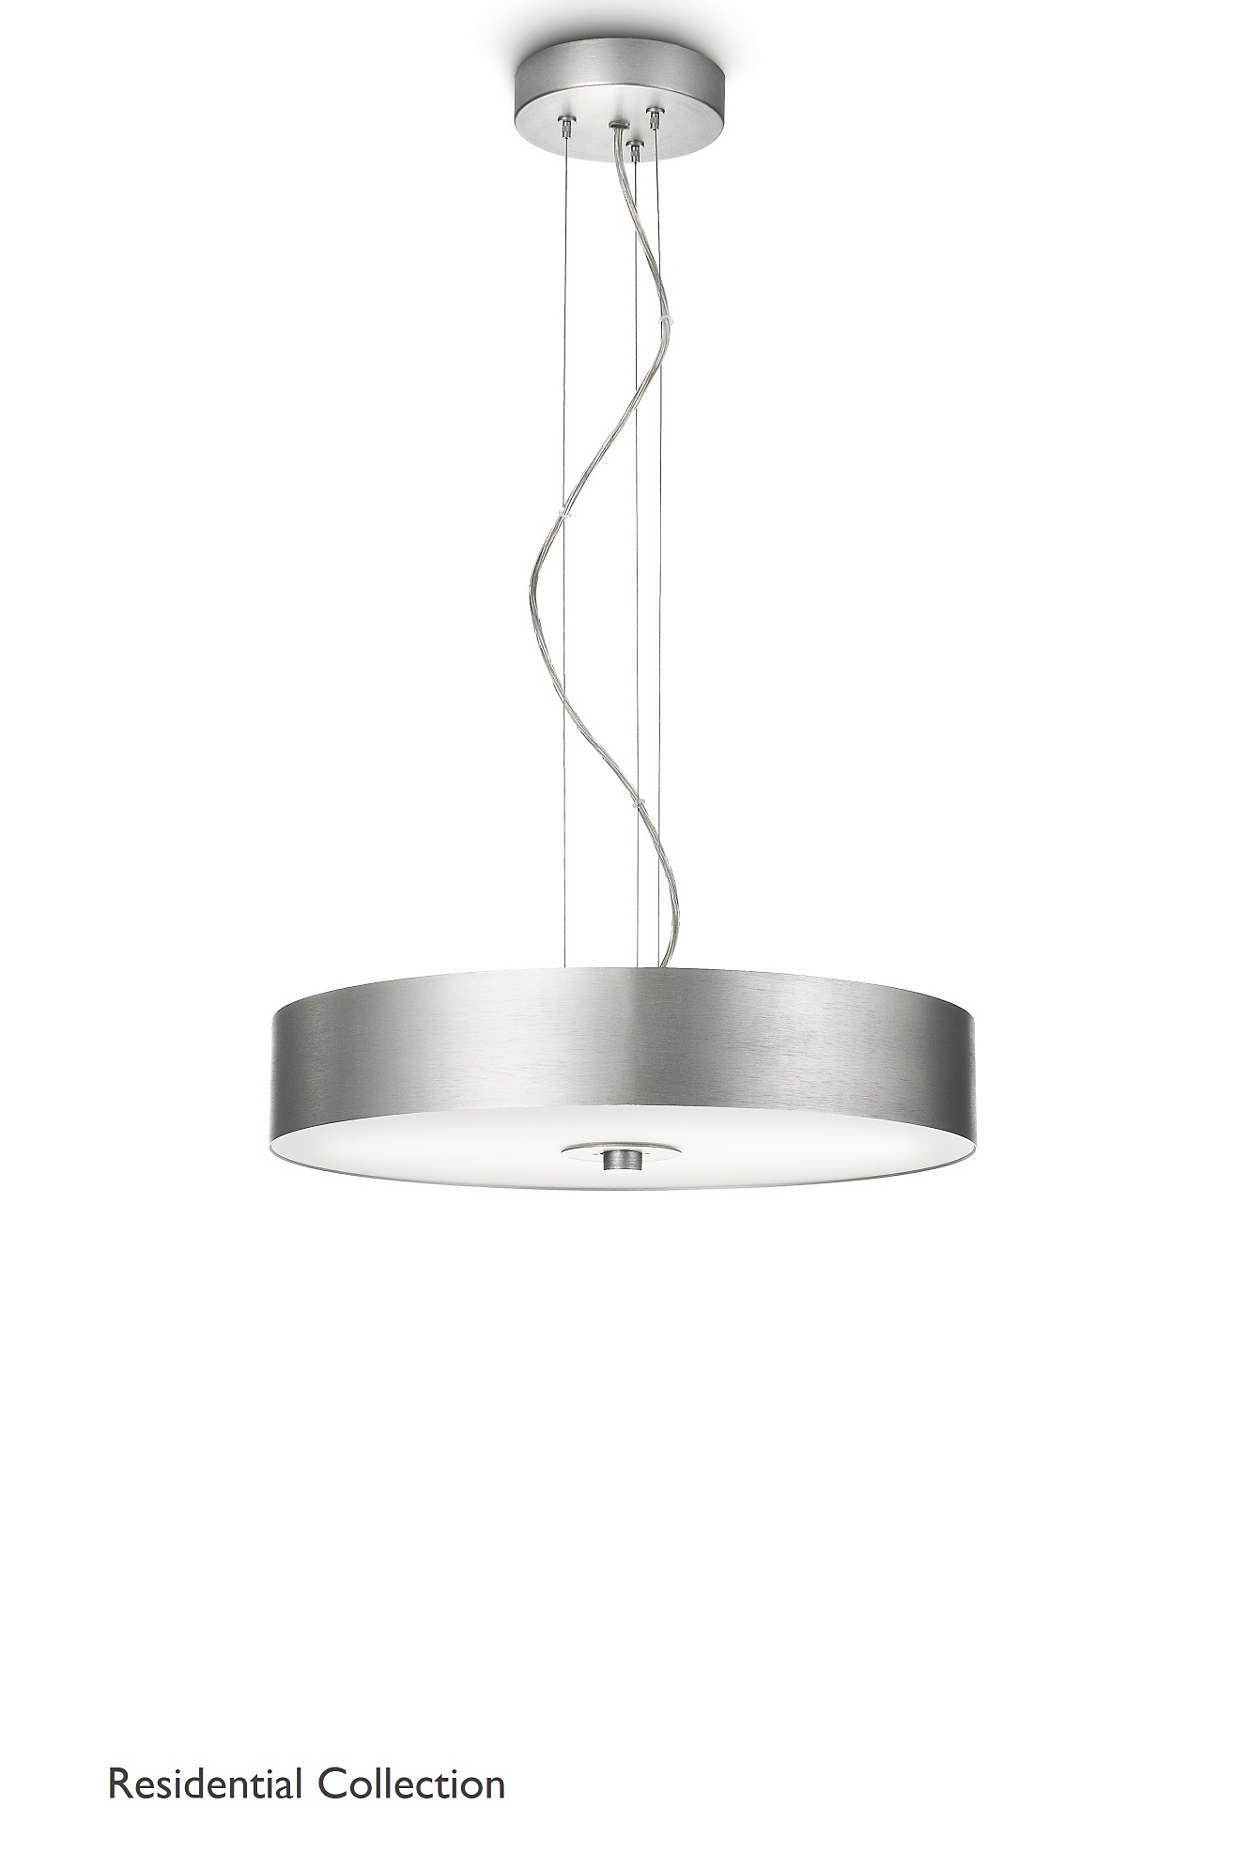 fair living philips lighting. Black Bedroom Furniture Sets. Home Design Ideas